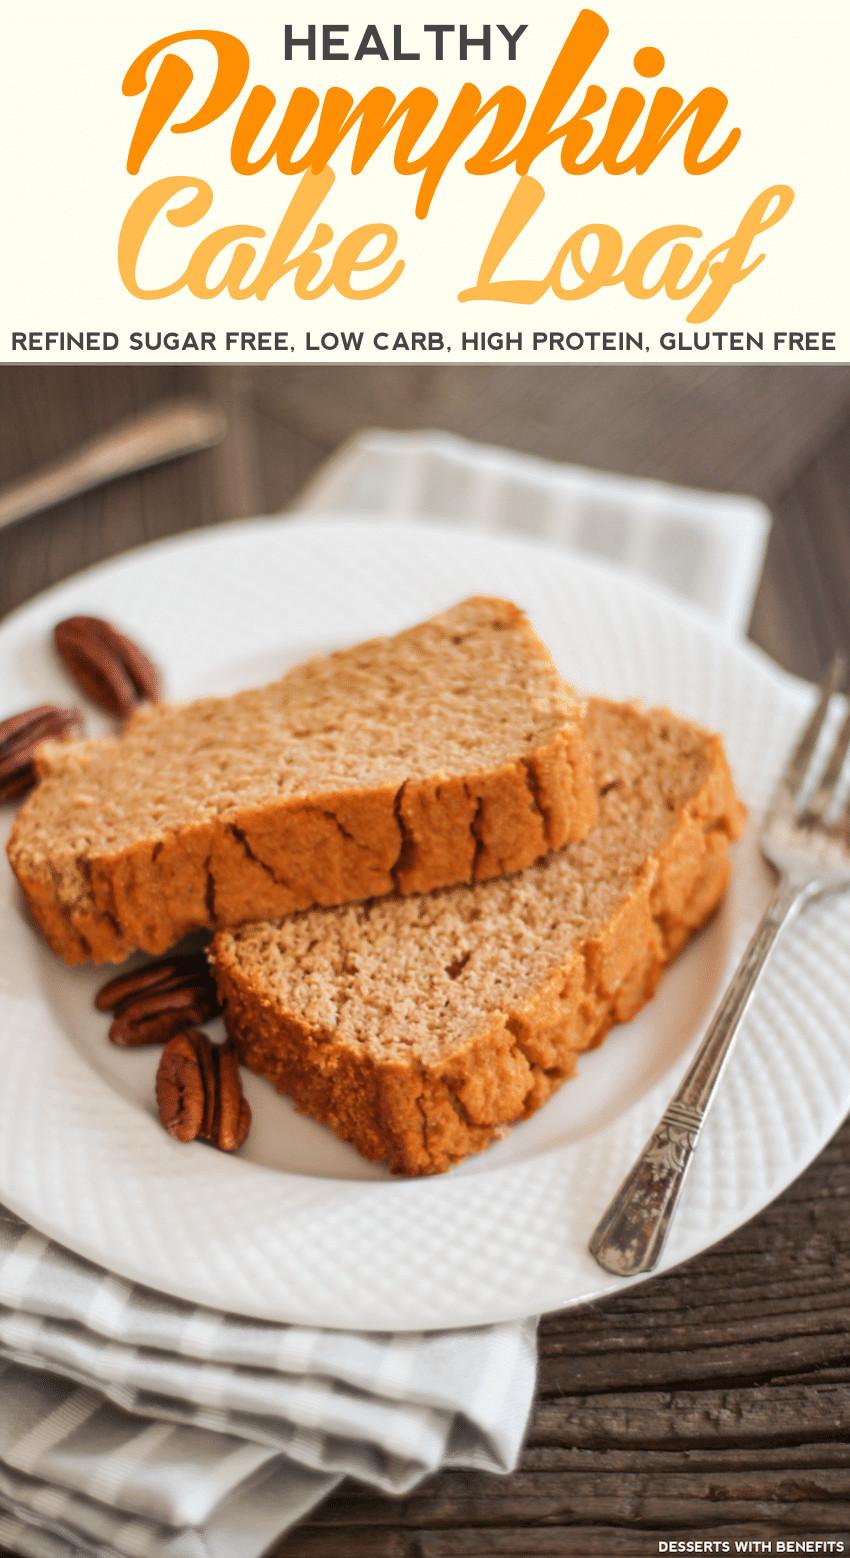 Gluten Free Dairy Free Sugar Free Dessert Recipes  Desserts With Benefits Healthy Pumpkin Cake Loaf recipe